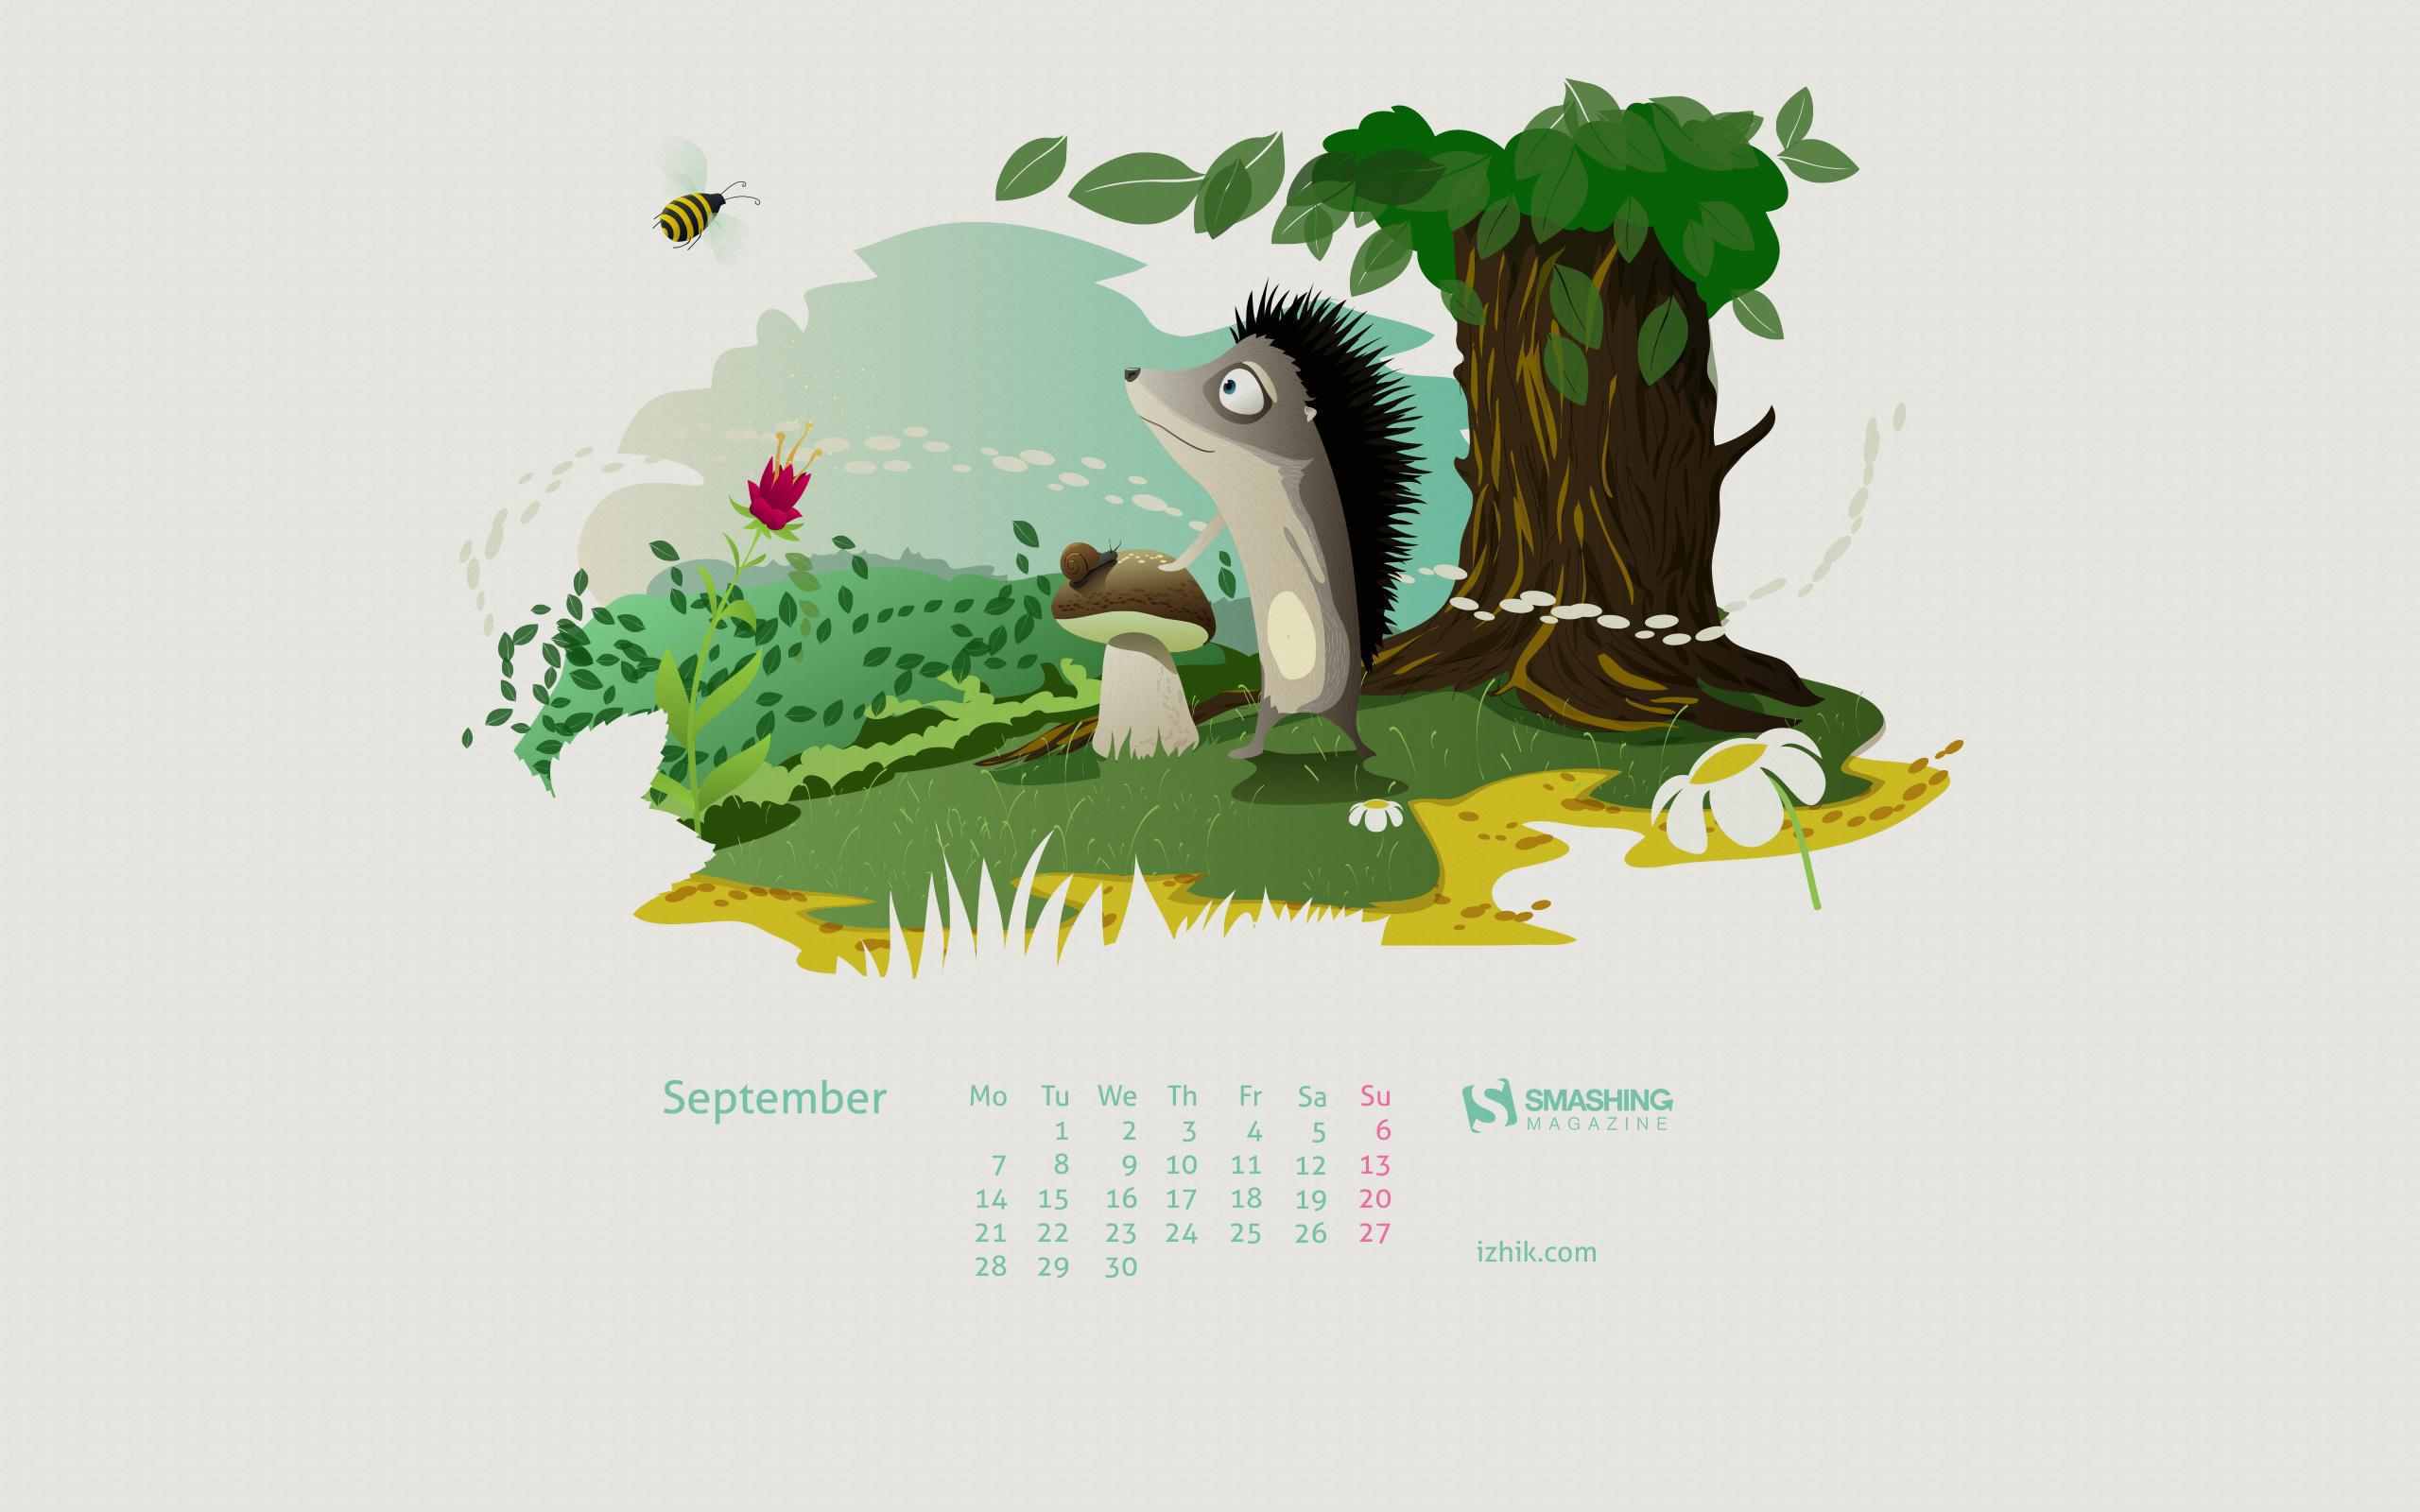 Calendar Wallpaper Quilling : Desktop wallpaper calendars september — smashing